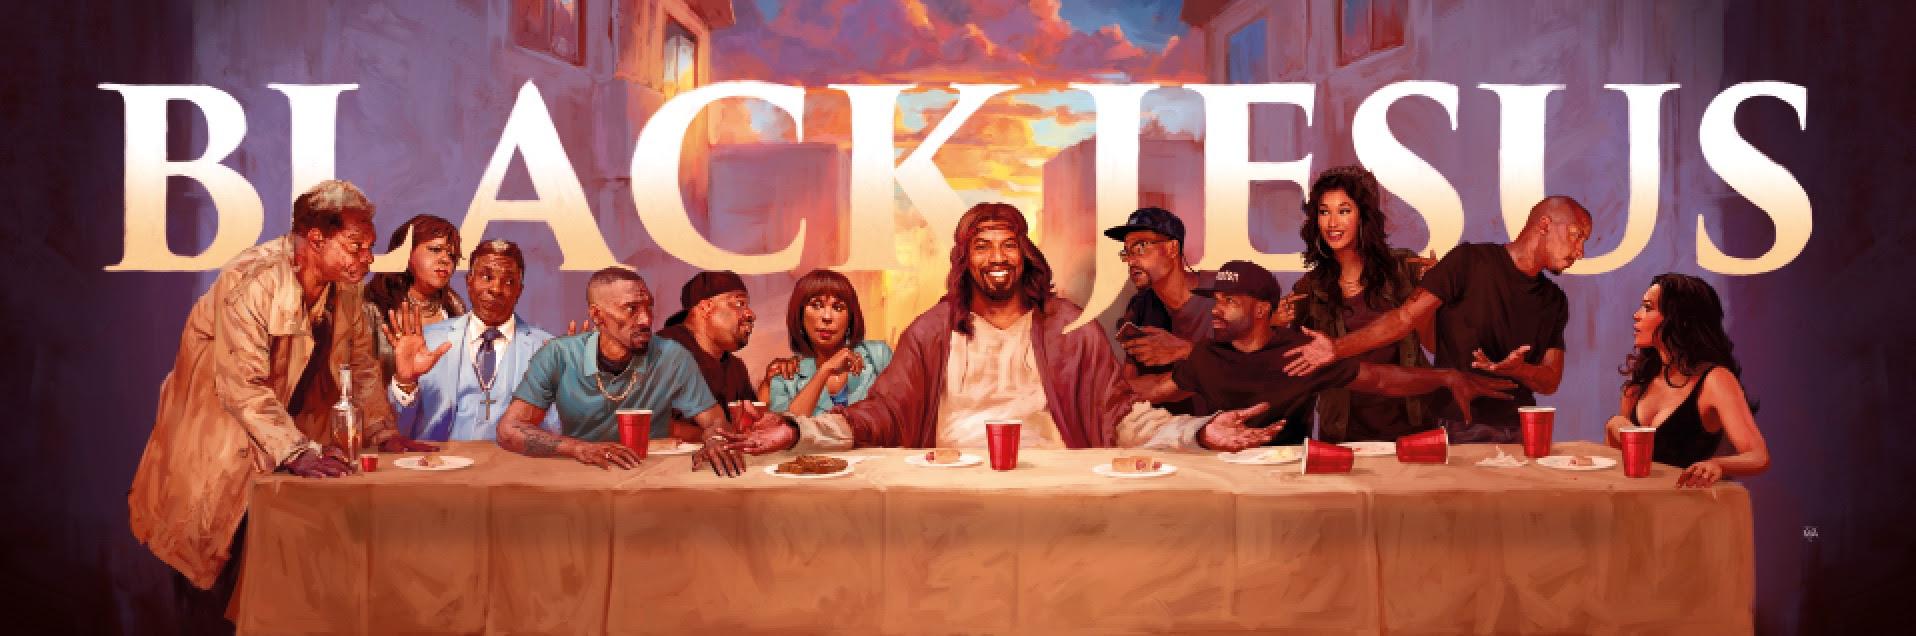 The Last Supper Of Black Jesus Adultswim